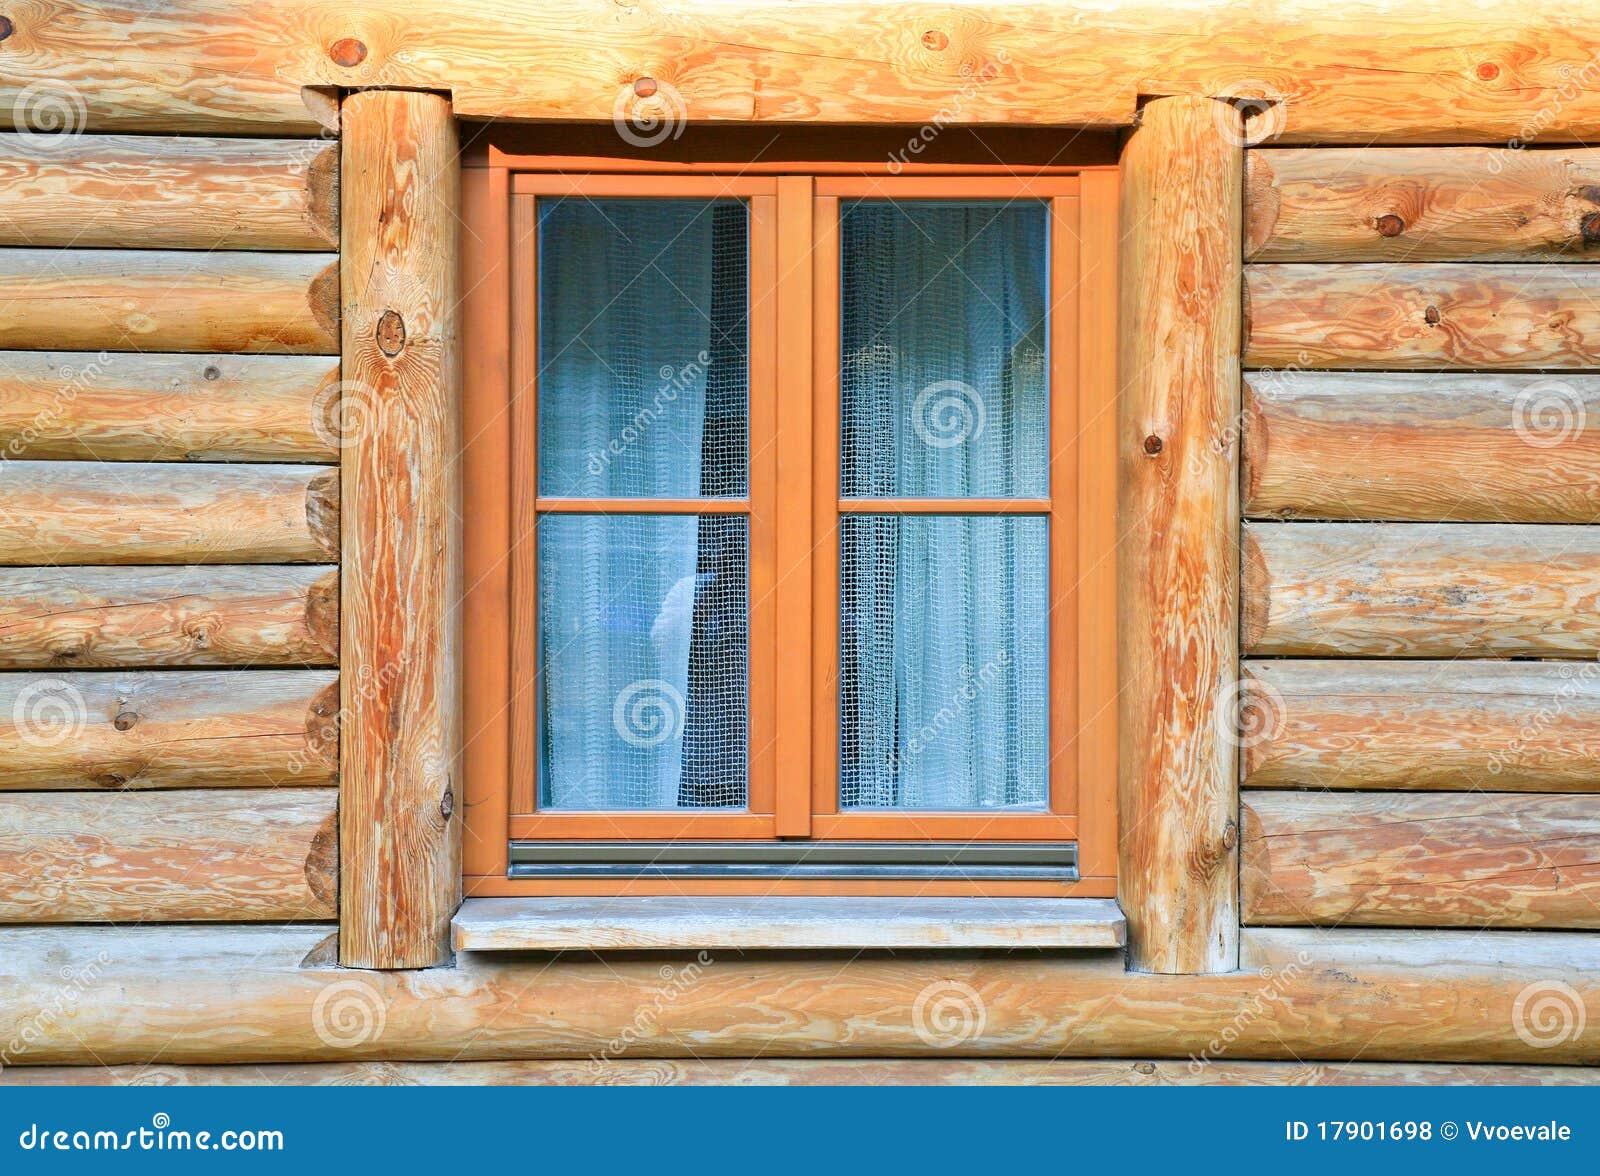 Ventana moderna en la casa de madera foto de archivo for Oggettistica moderna per la casa